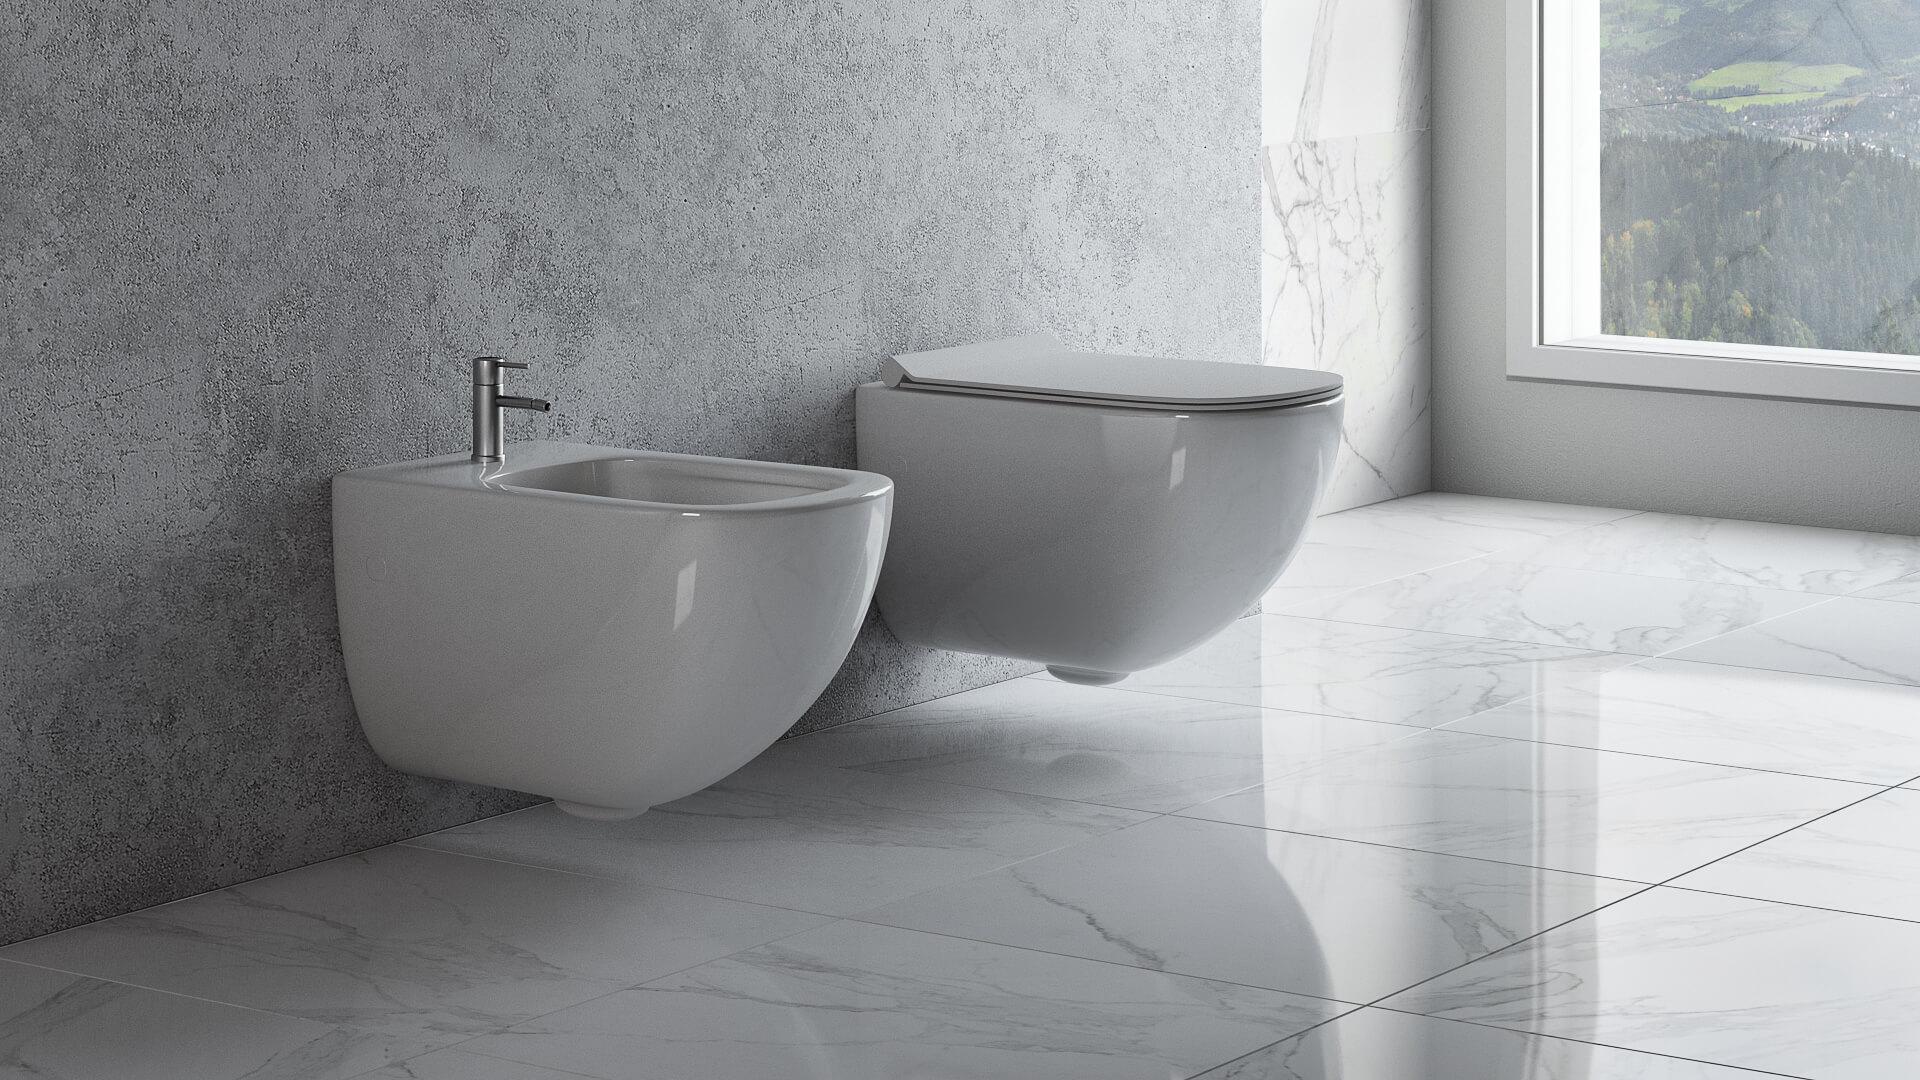 Sanitary Ware 3D Models in a Photorealistic Bathroom Scene